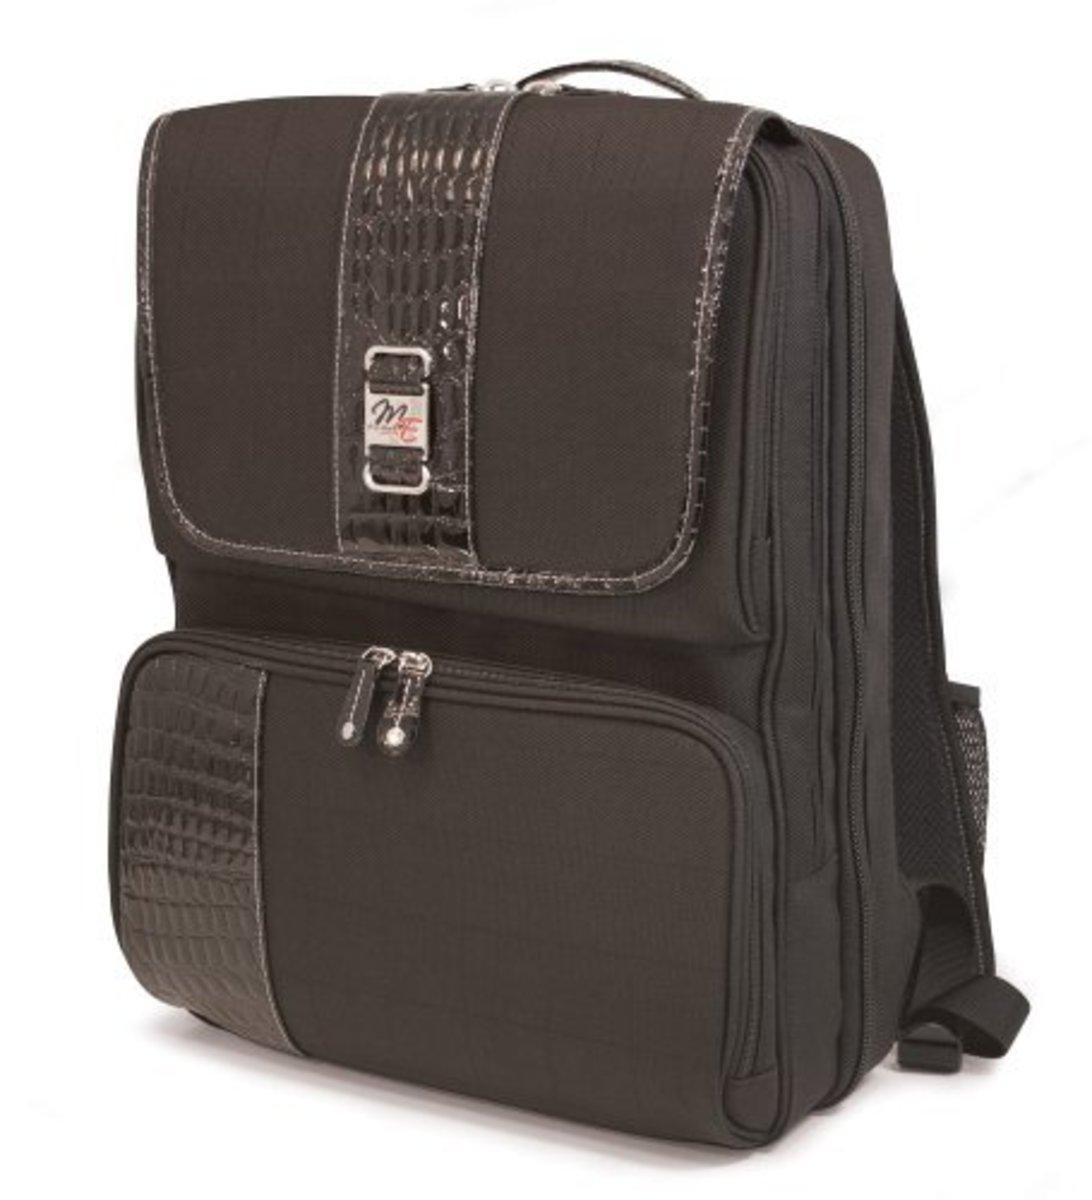 Mobile Edge ScanFast Onyx Backpack- 16-Inch PC/17-Inch Mac